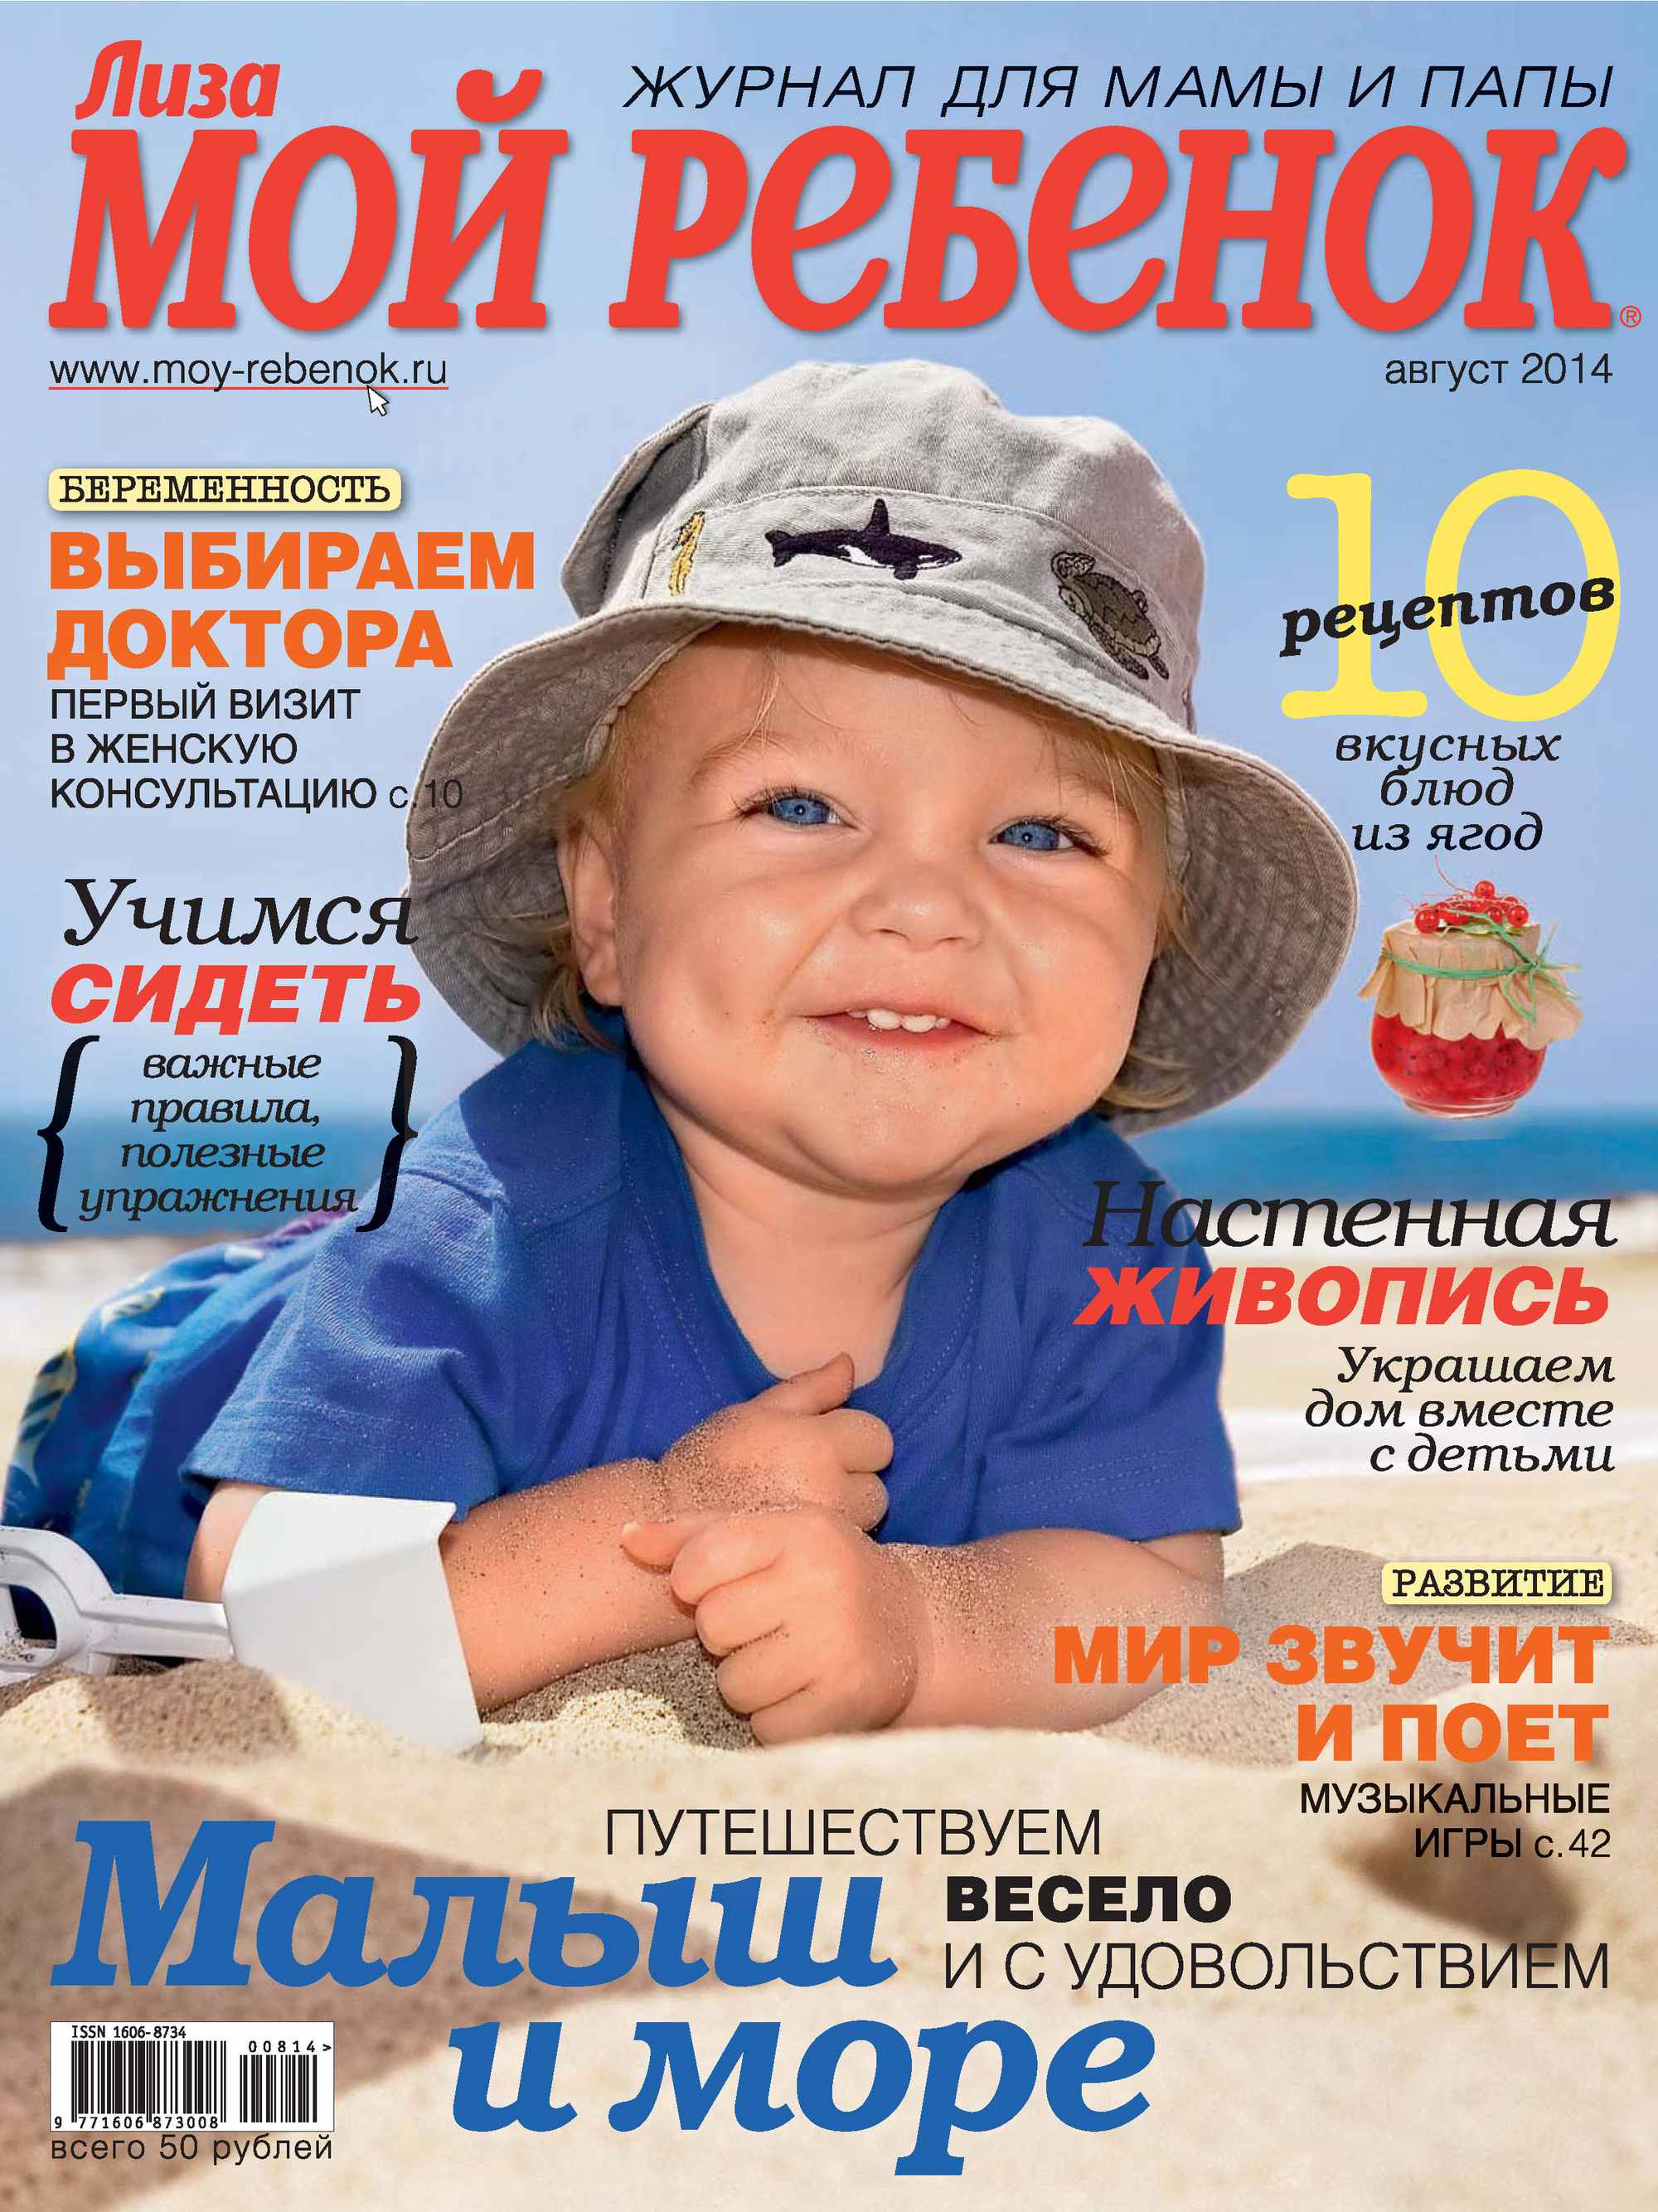 ИД «Бурда» Журнал «Лиза. Мой ребенок» №08/2014 ид бурда журнал лиза мой ребенок 11 2014